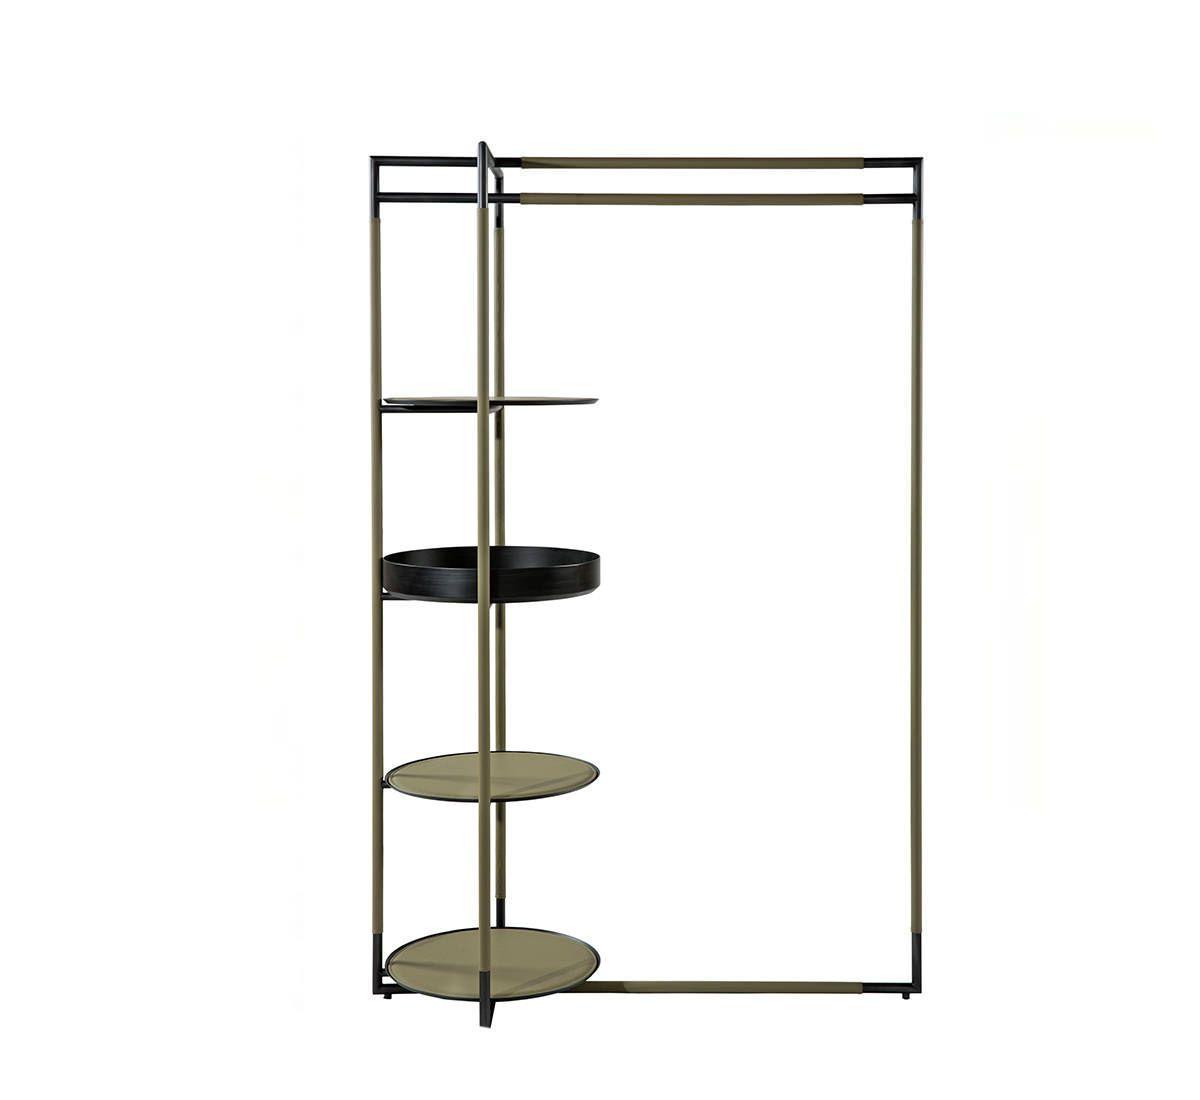 steh herrendiener modern aus stahl holz bak by ferruccio laviani frag in the closet. Black Bedroom Furniture Sets. Home Design Ideas